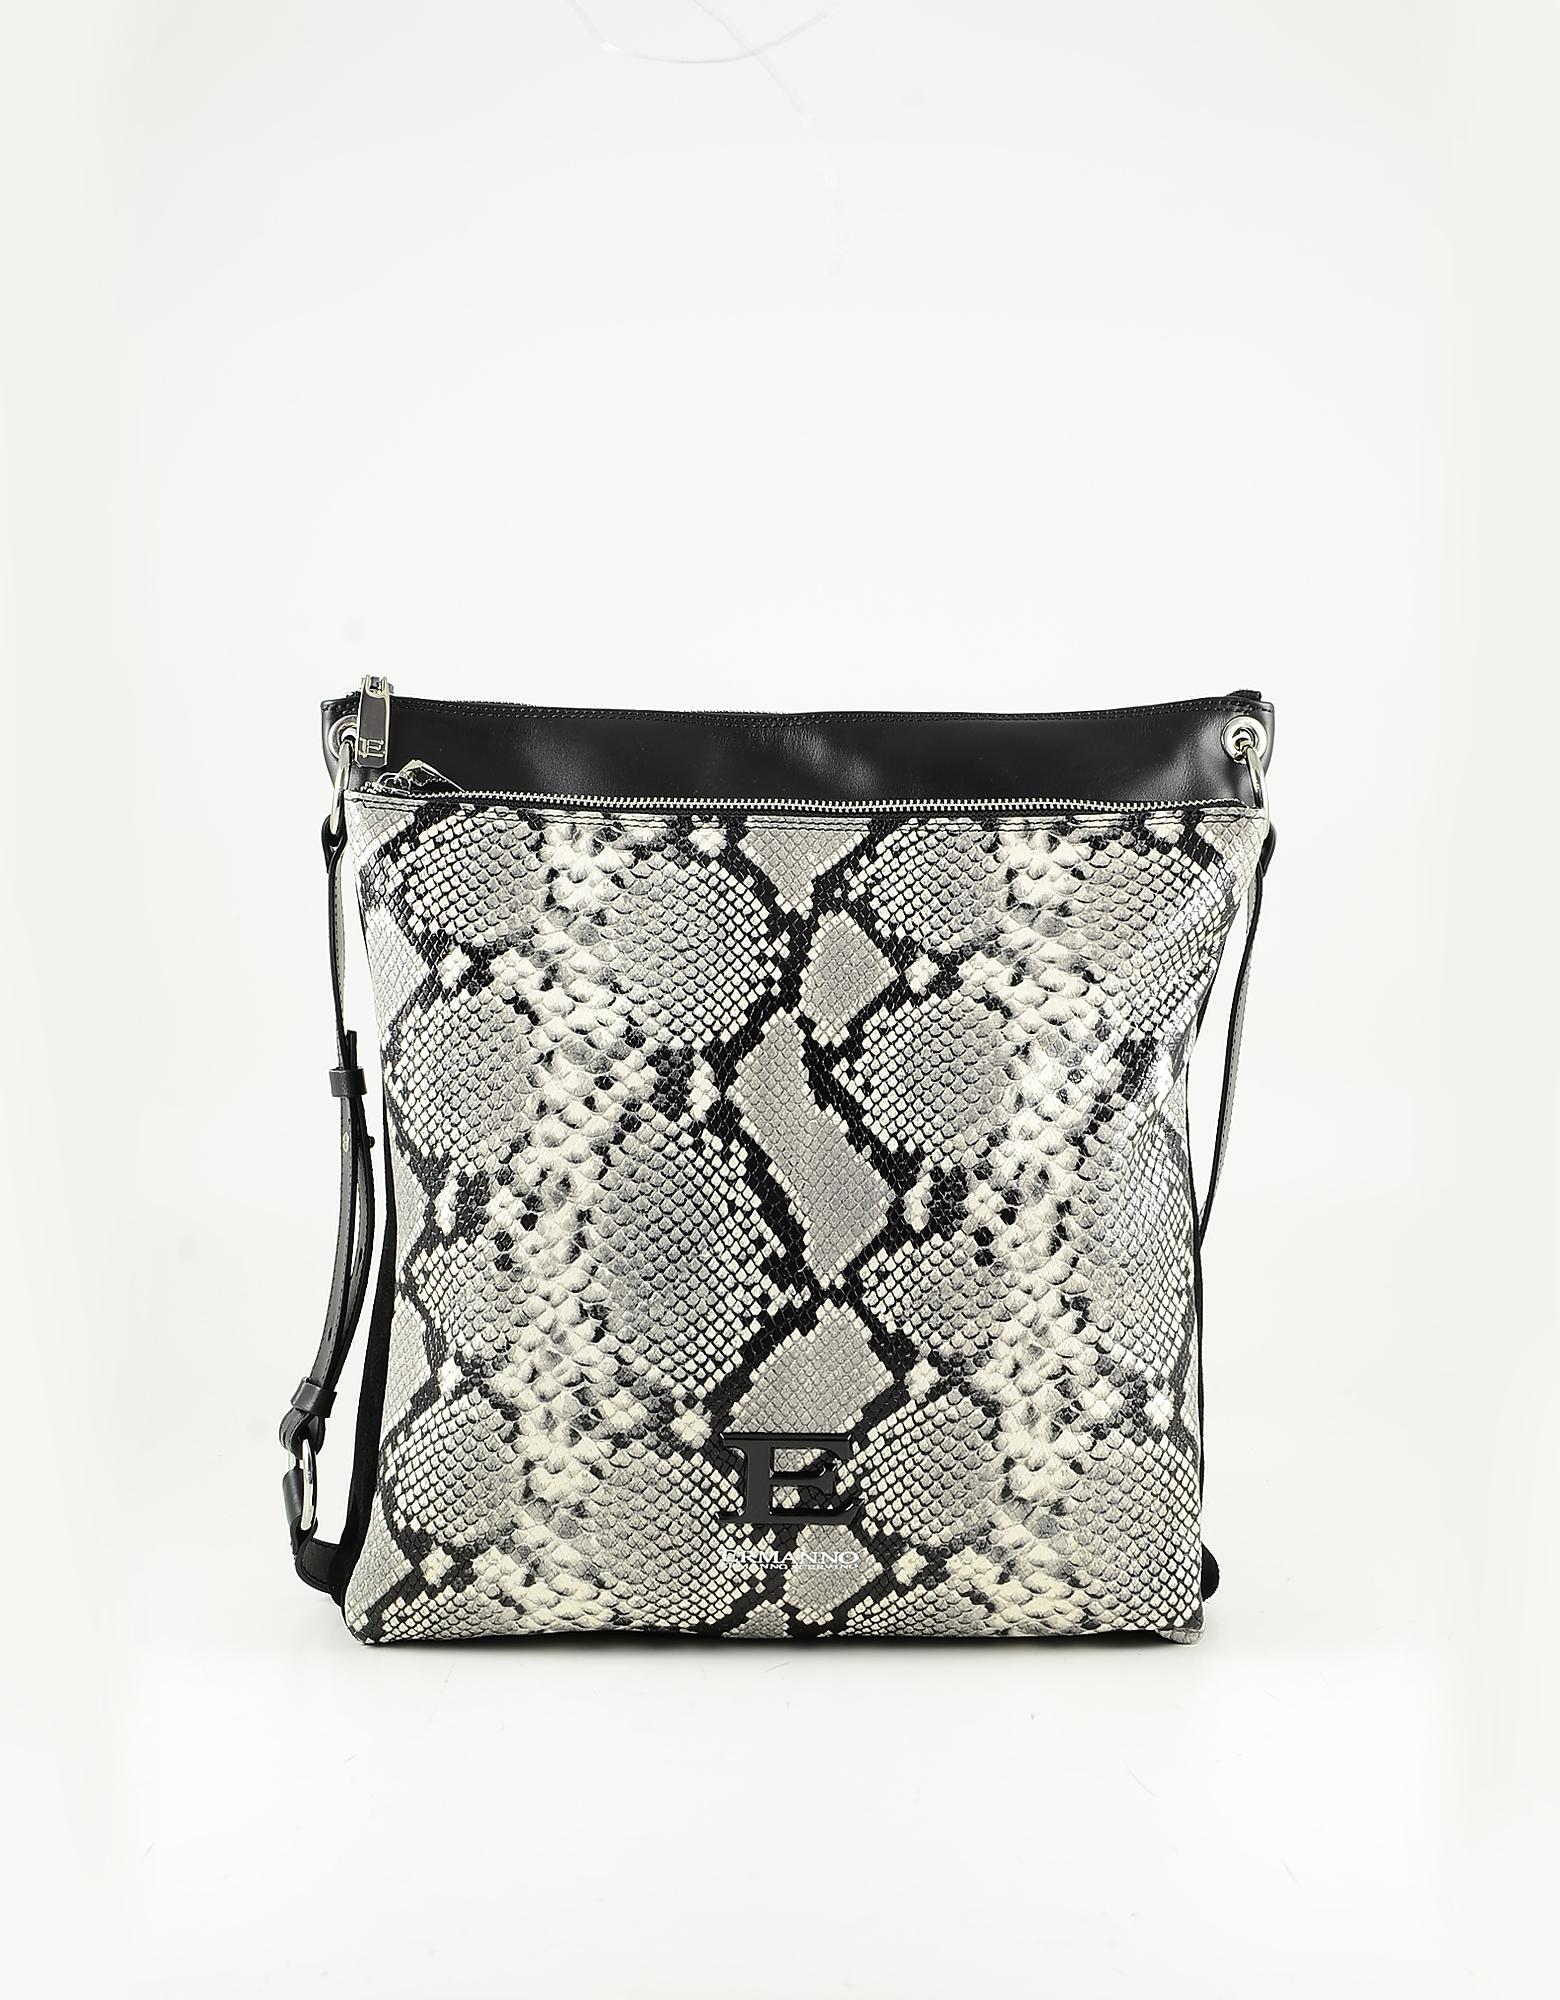 Ermanno Scervino Gray Python Embossed Leather Crossbody Bag